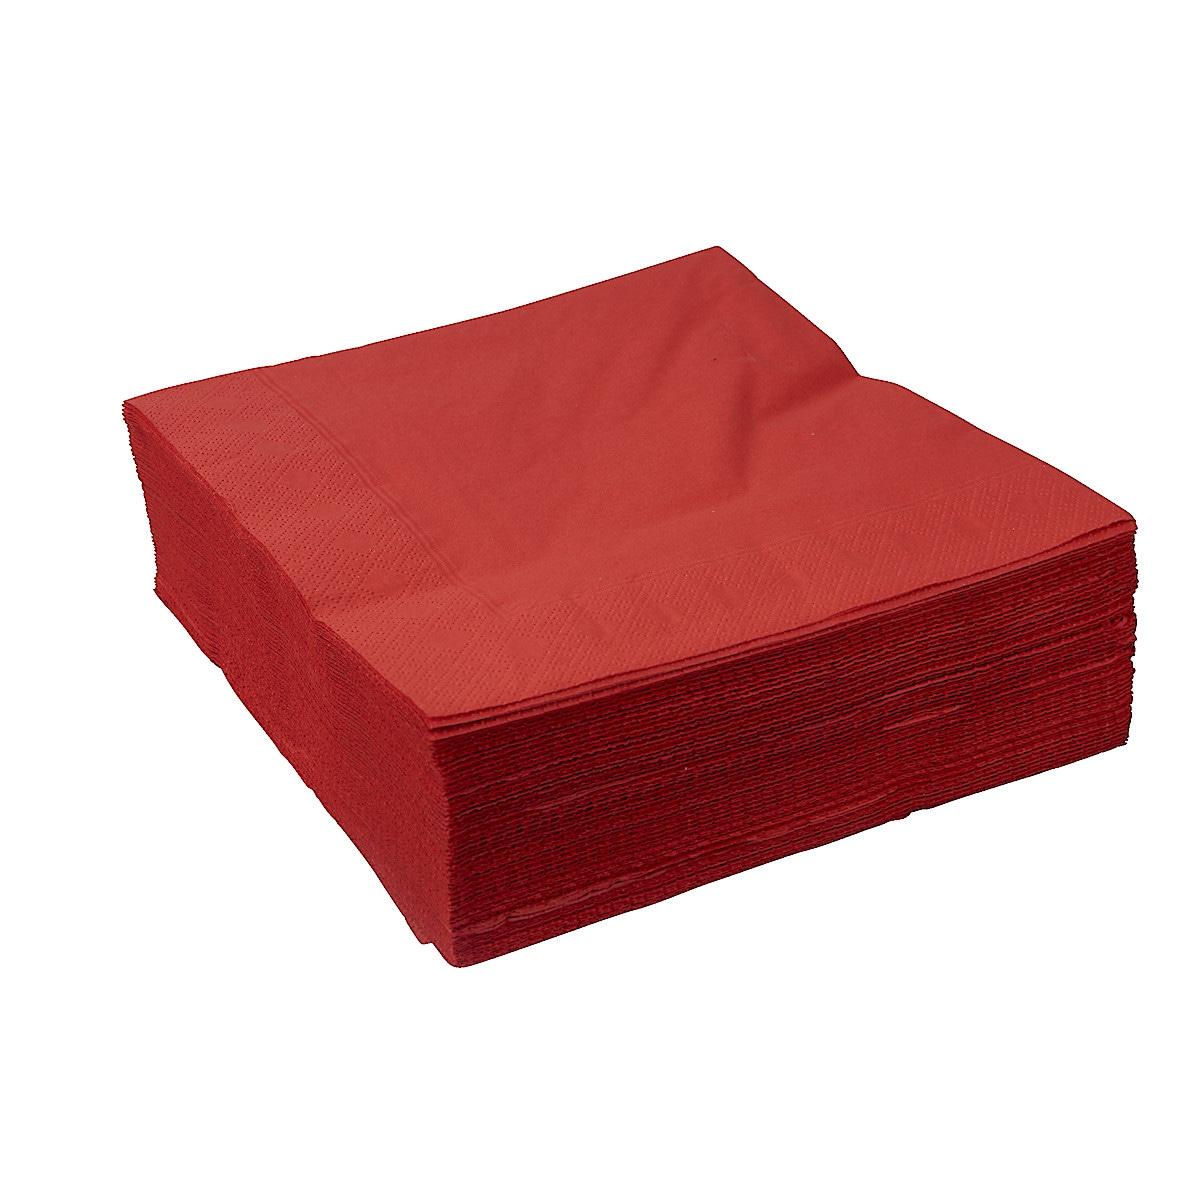 Servetit 50 kpl, punainen